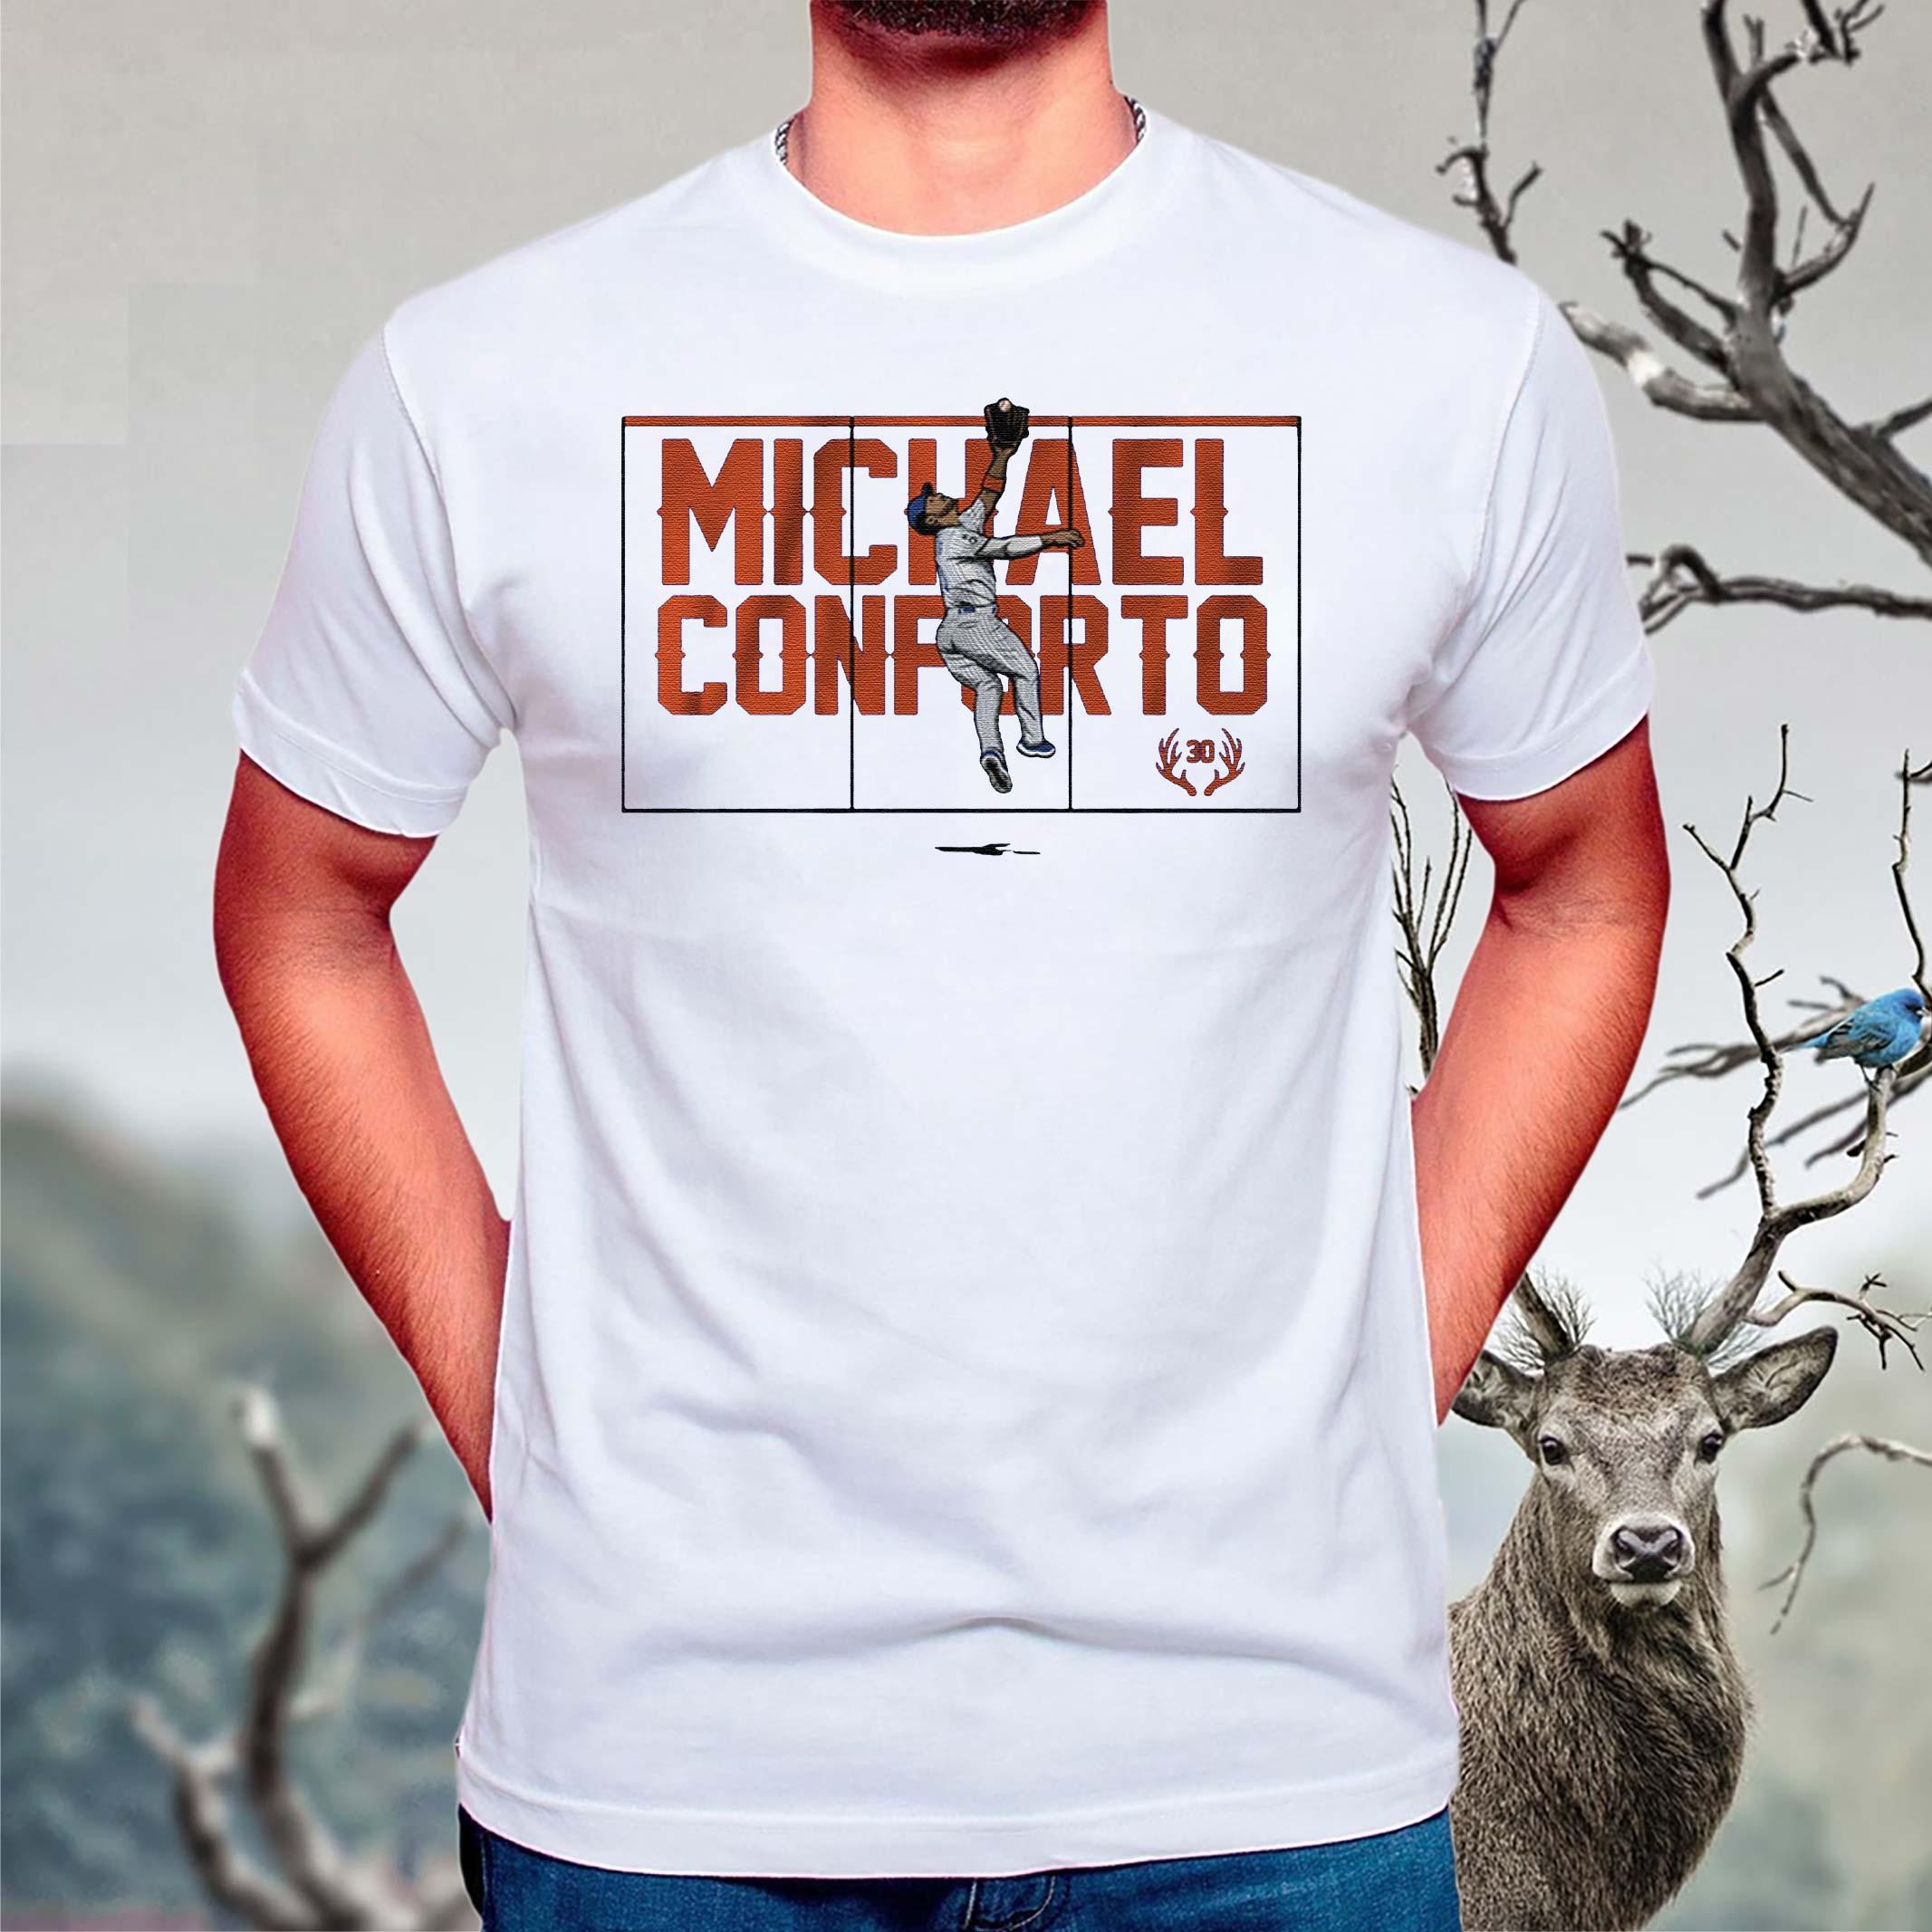 Michael-Conforto-T-Shirts